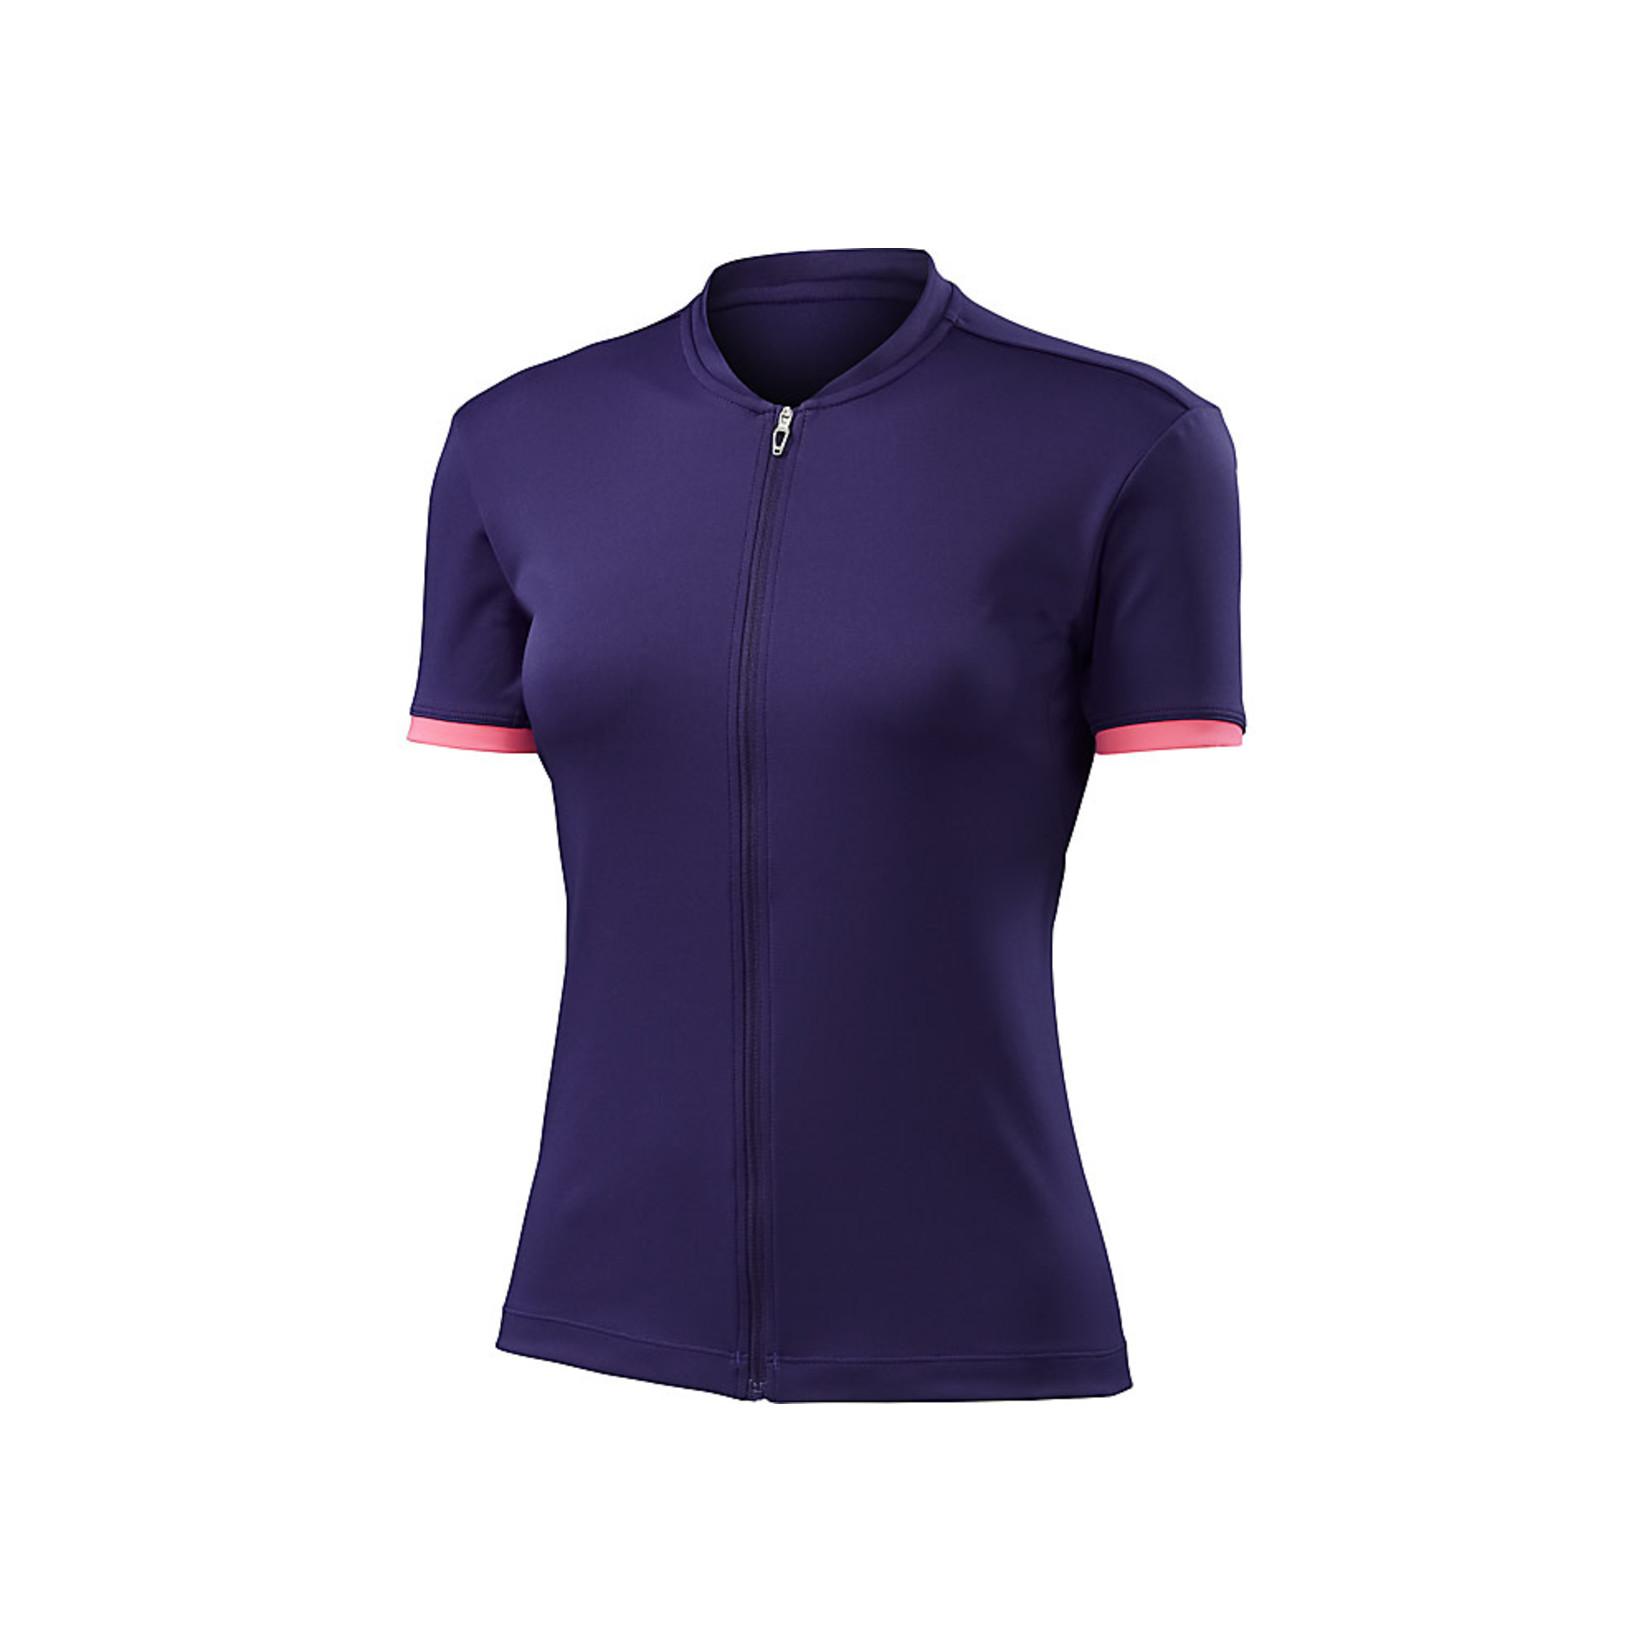 Specialized Women's RBX Sport Jersey Deep Indigo/Neon Pink Medium